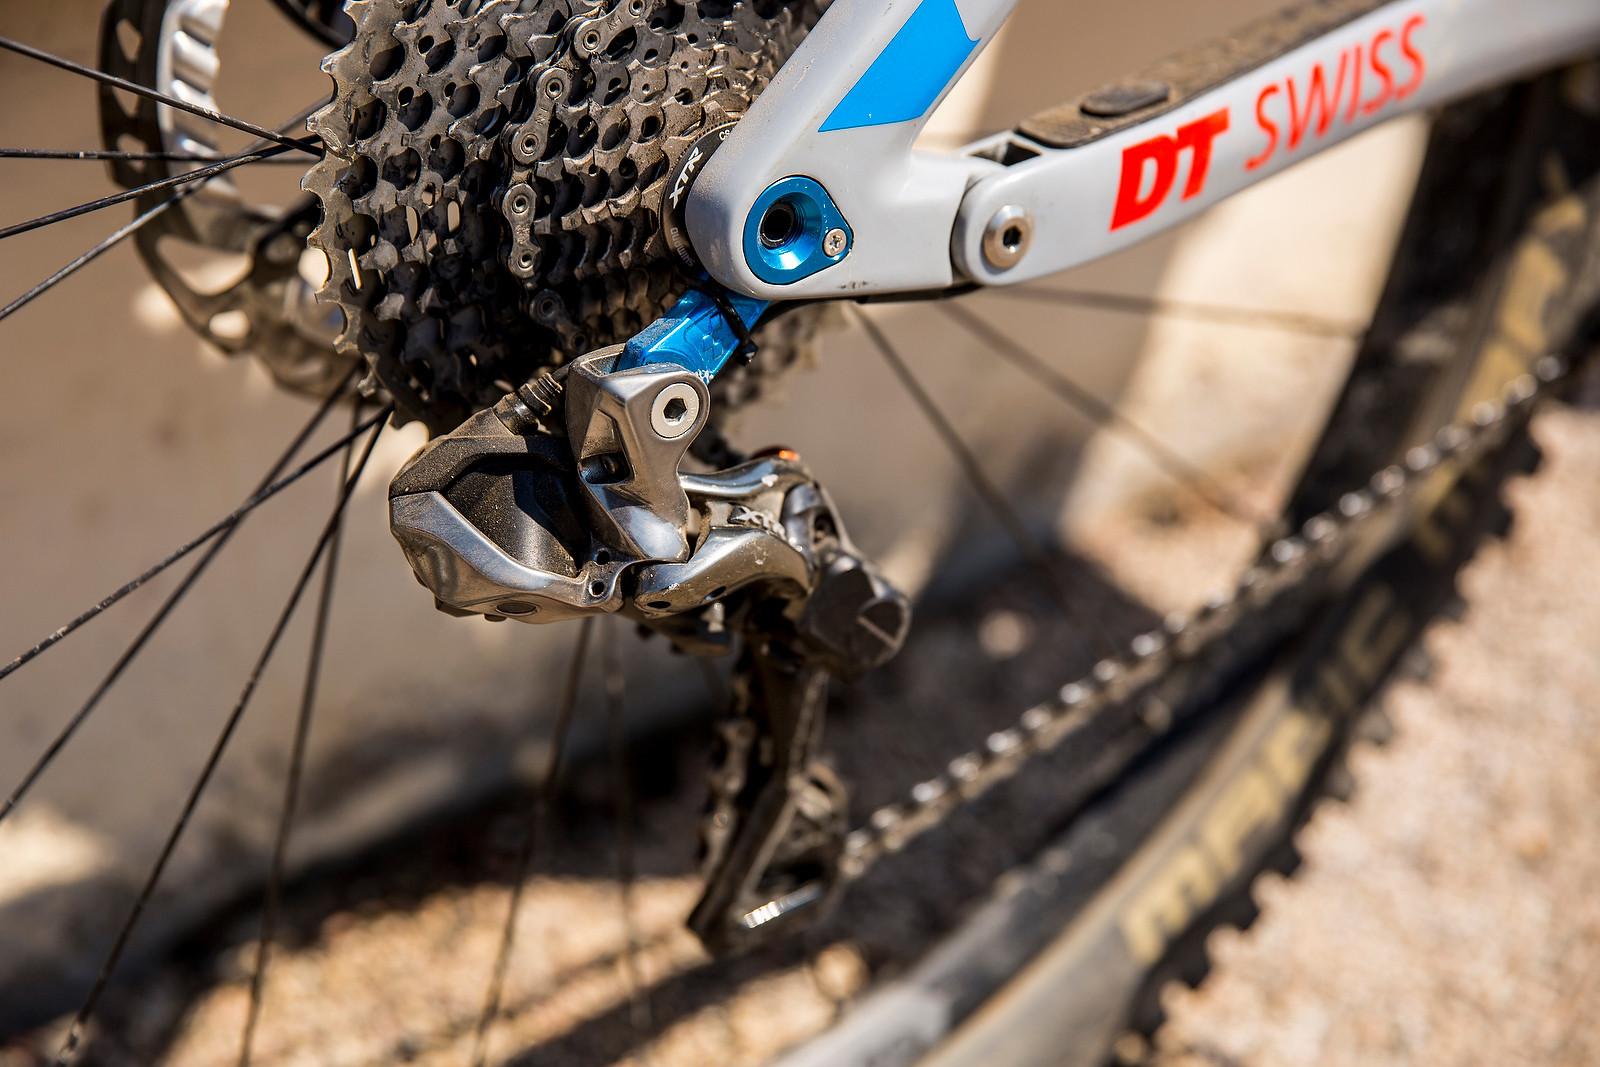 Shimano XTR Di2 Rear Derailleur - WINNING BIKE: Nico Lau's Cube Stereo 140 29 - Mountain Biking Pictures - Vital MTB